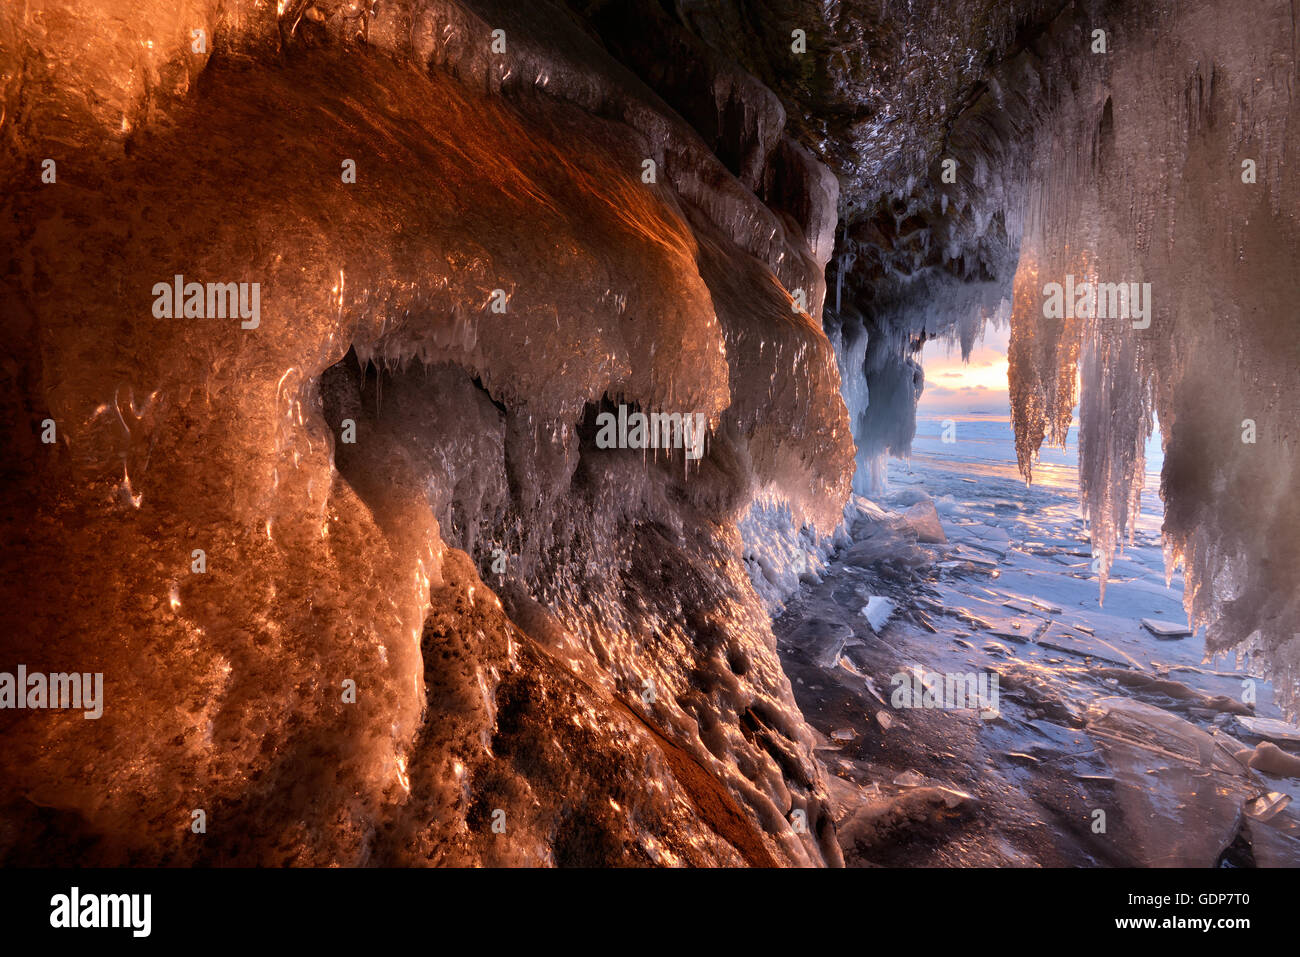 Kharantsy ice caves at sunset, Baikal Lake, Olkhon Island, Siberia, Russia - Stock Image